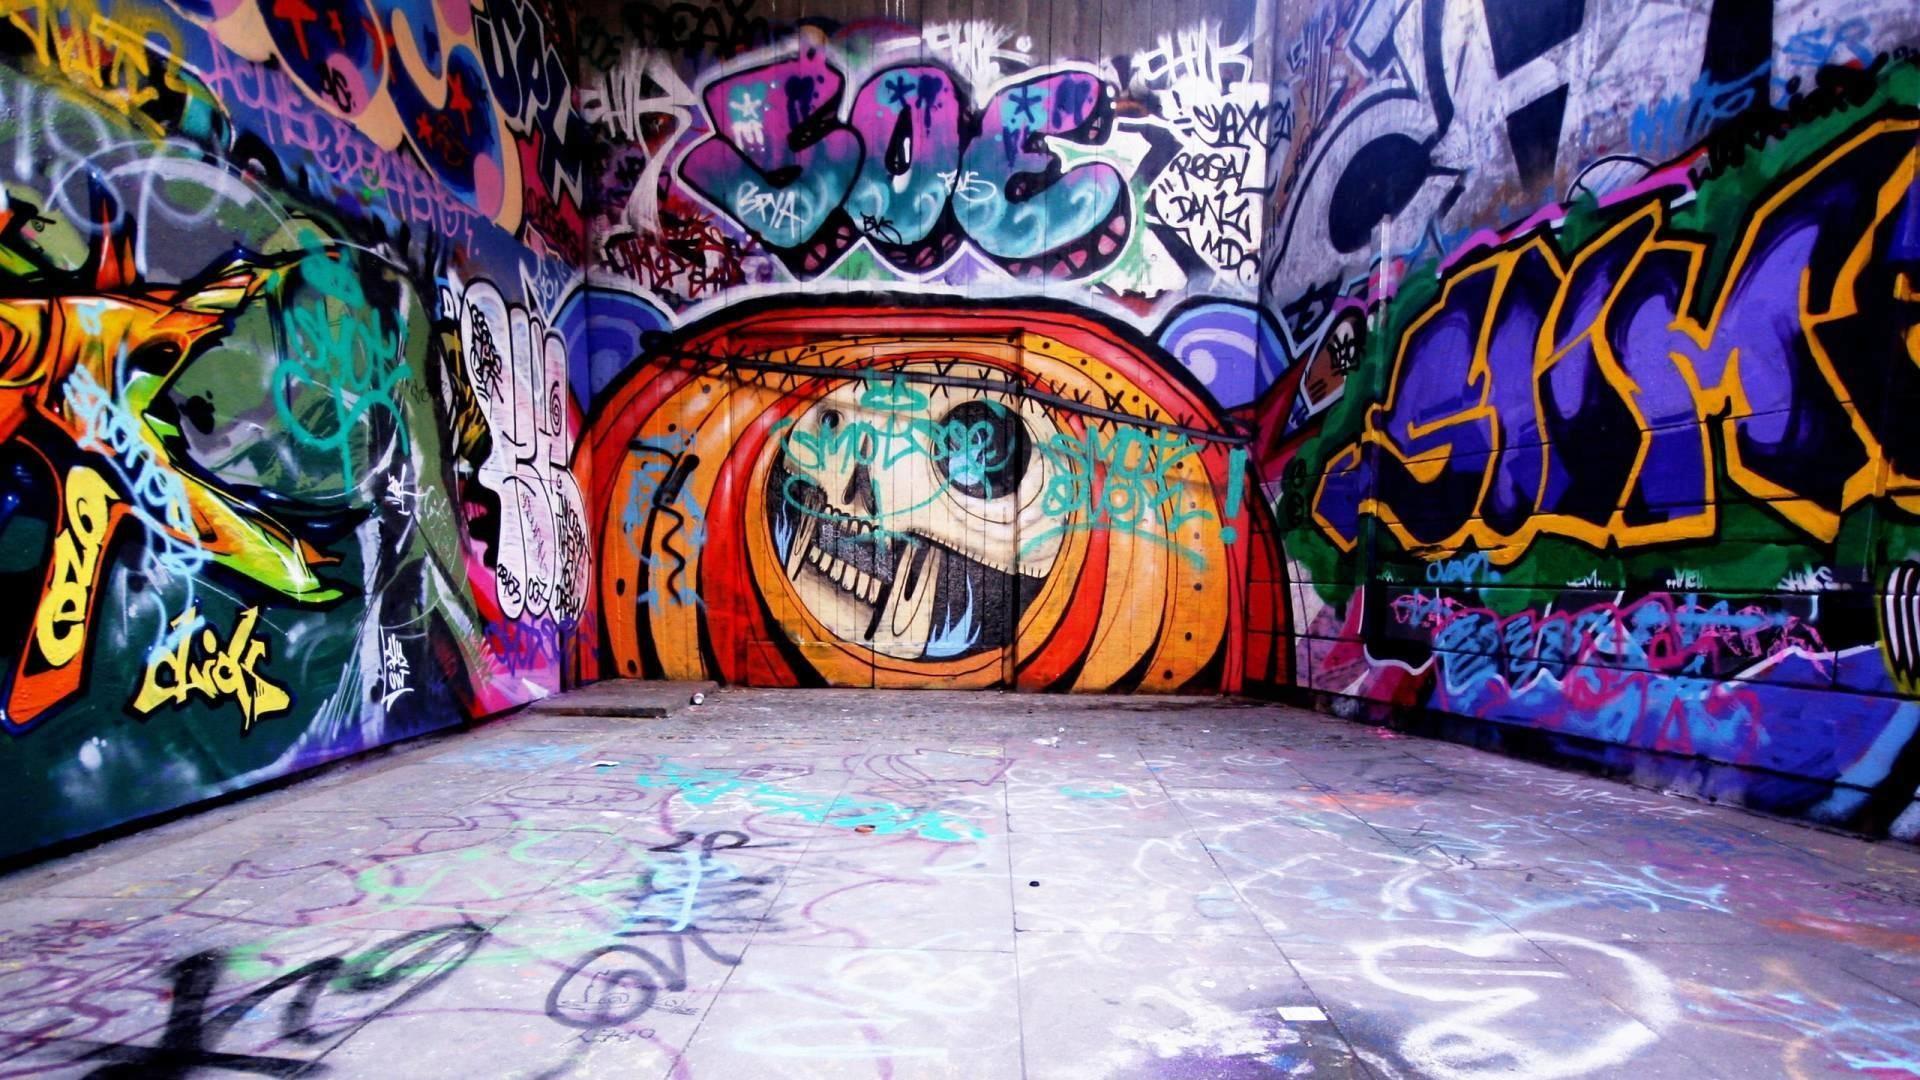 Music graffiti wallpaper desktop